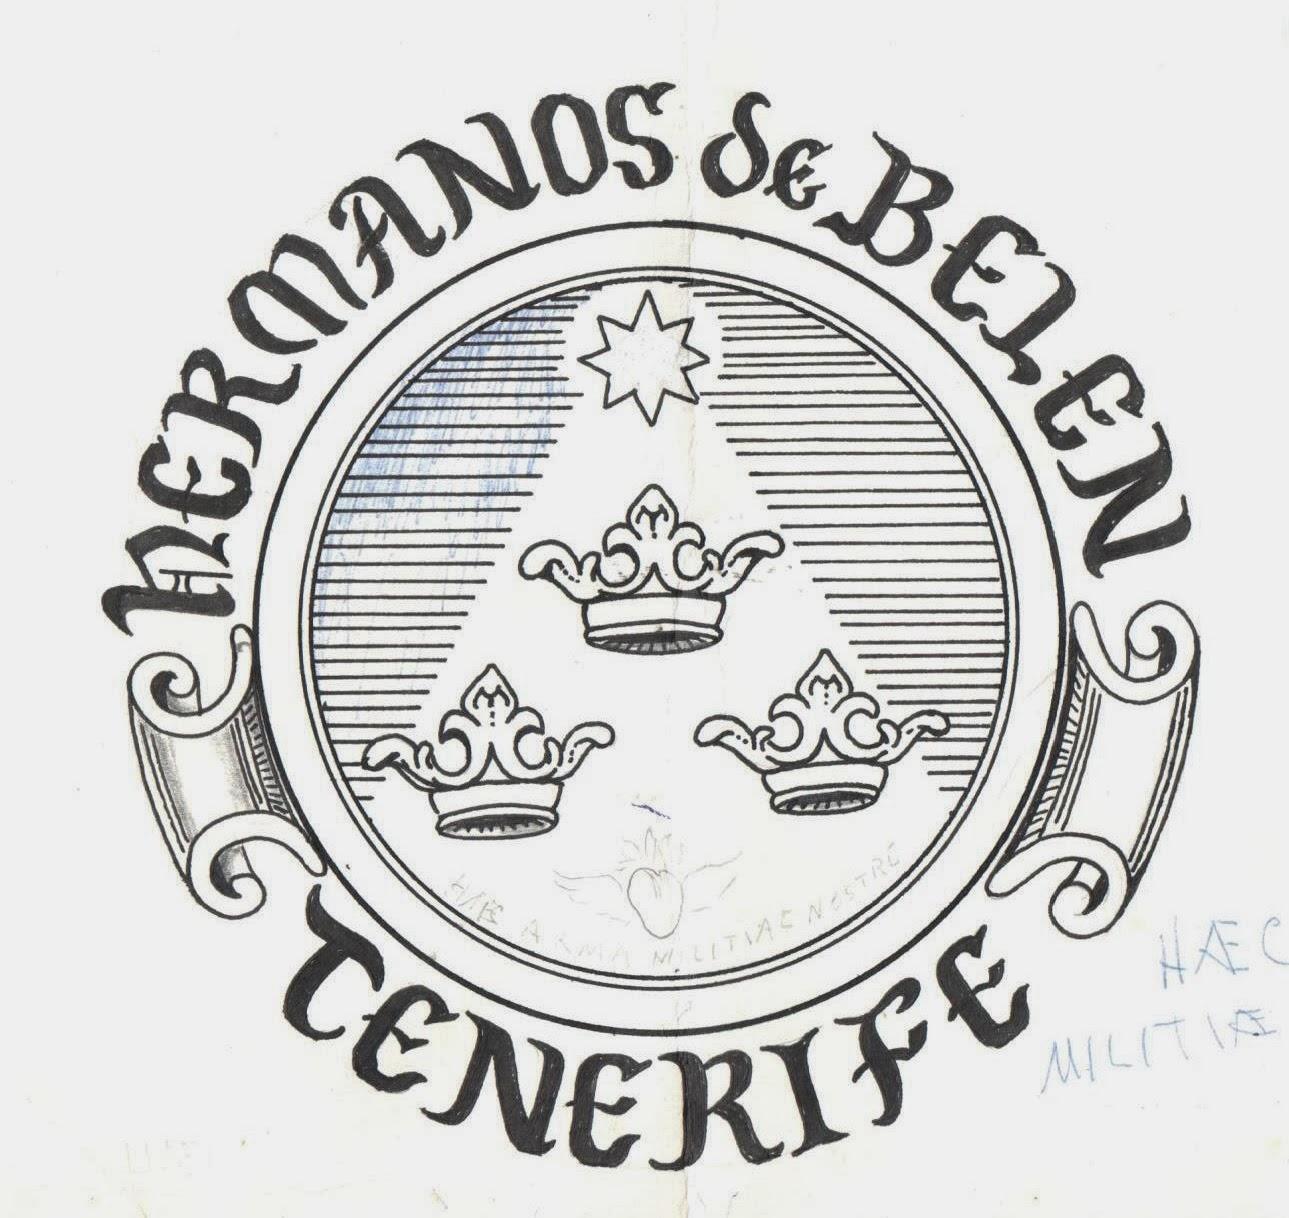 Casa de Acogiida Herrmanos de Bellén -- Posada de Belén